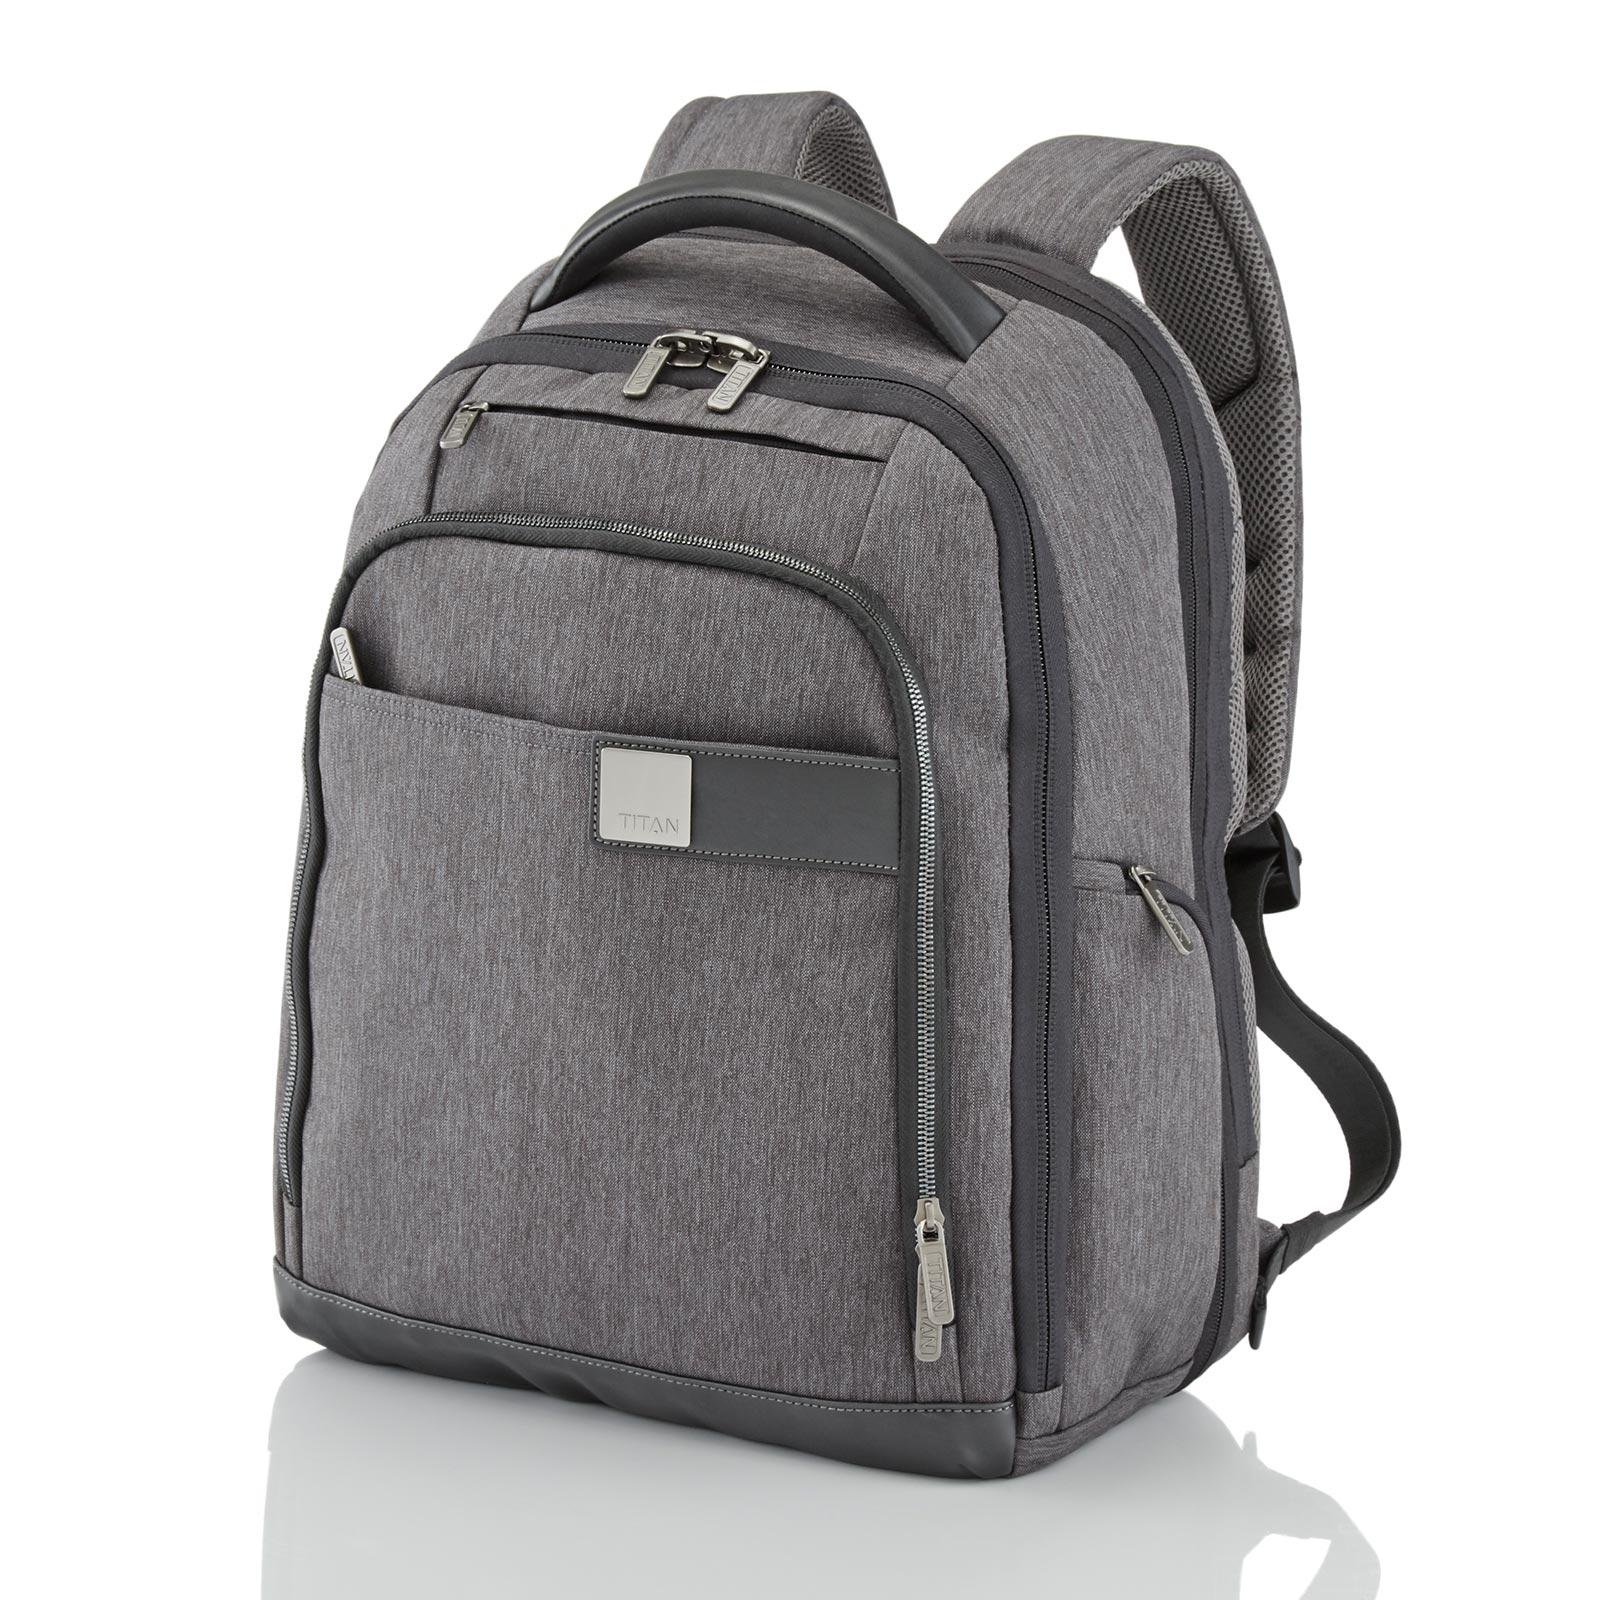 TITAN Power Pack Rucksack 35 cm erweiterbar 32 l - Grau 379501-04